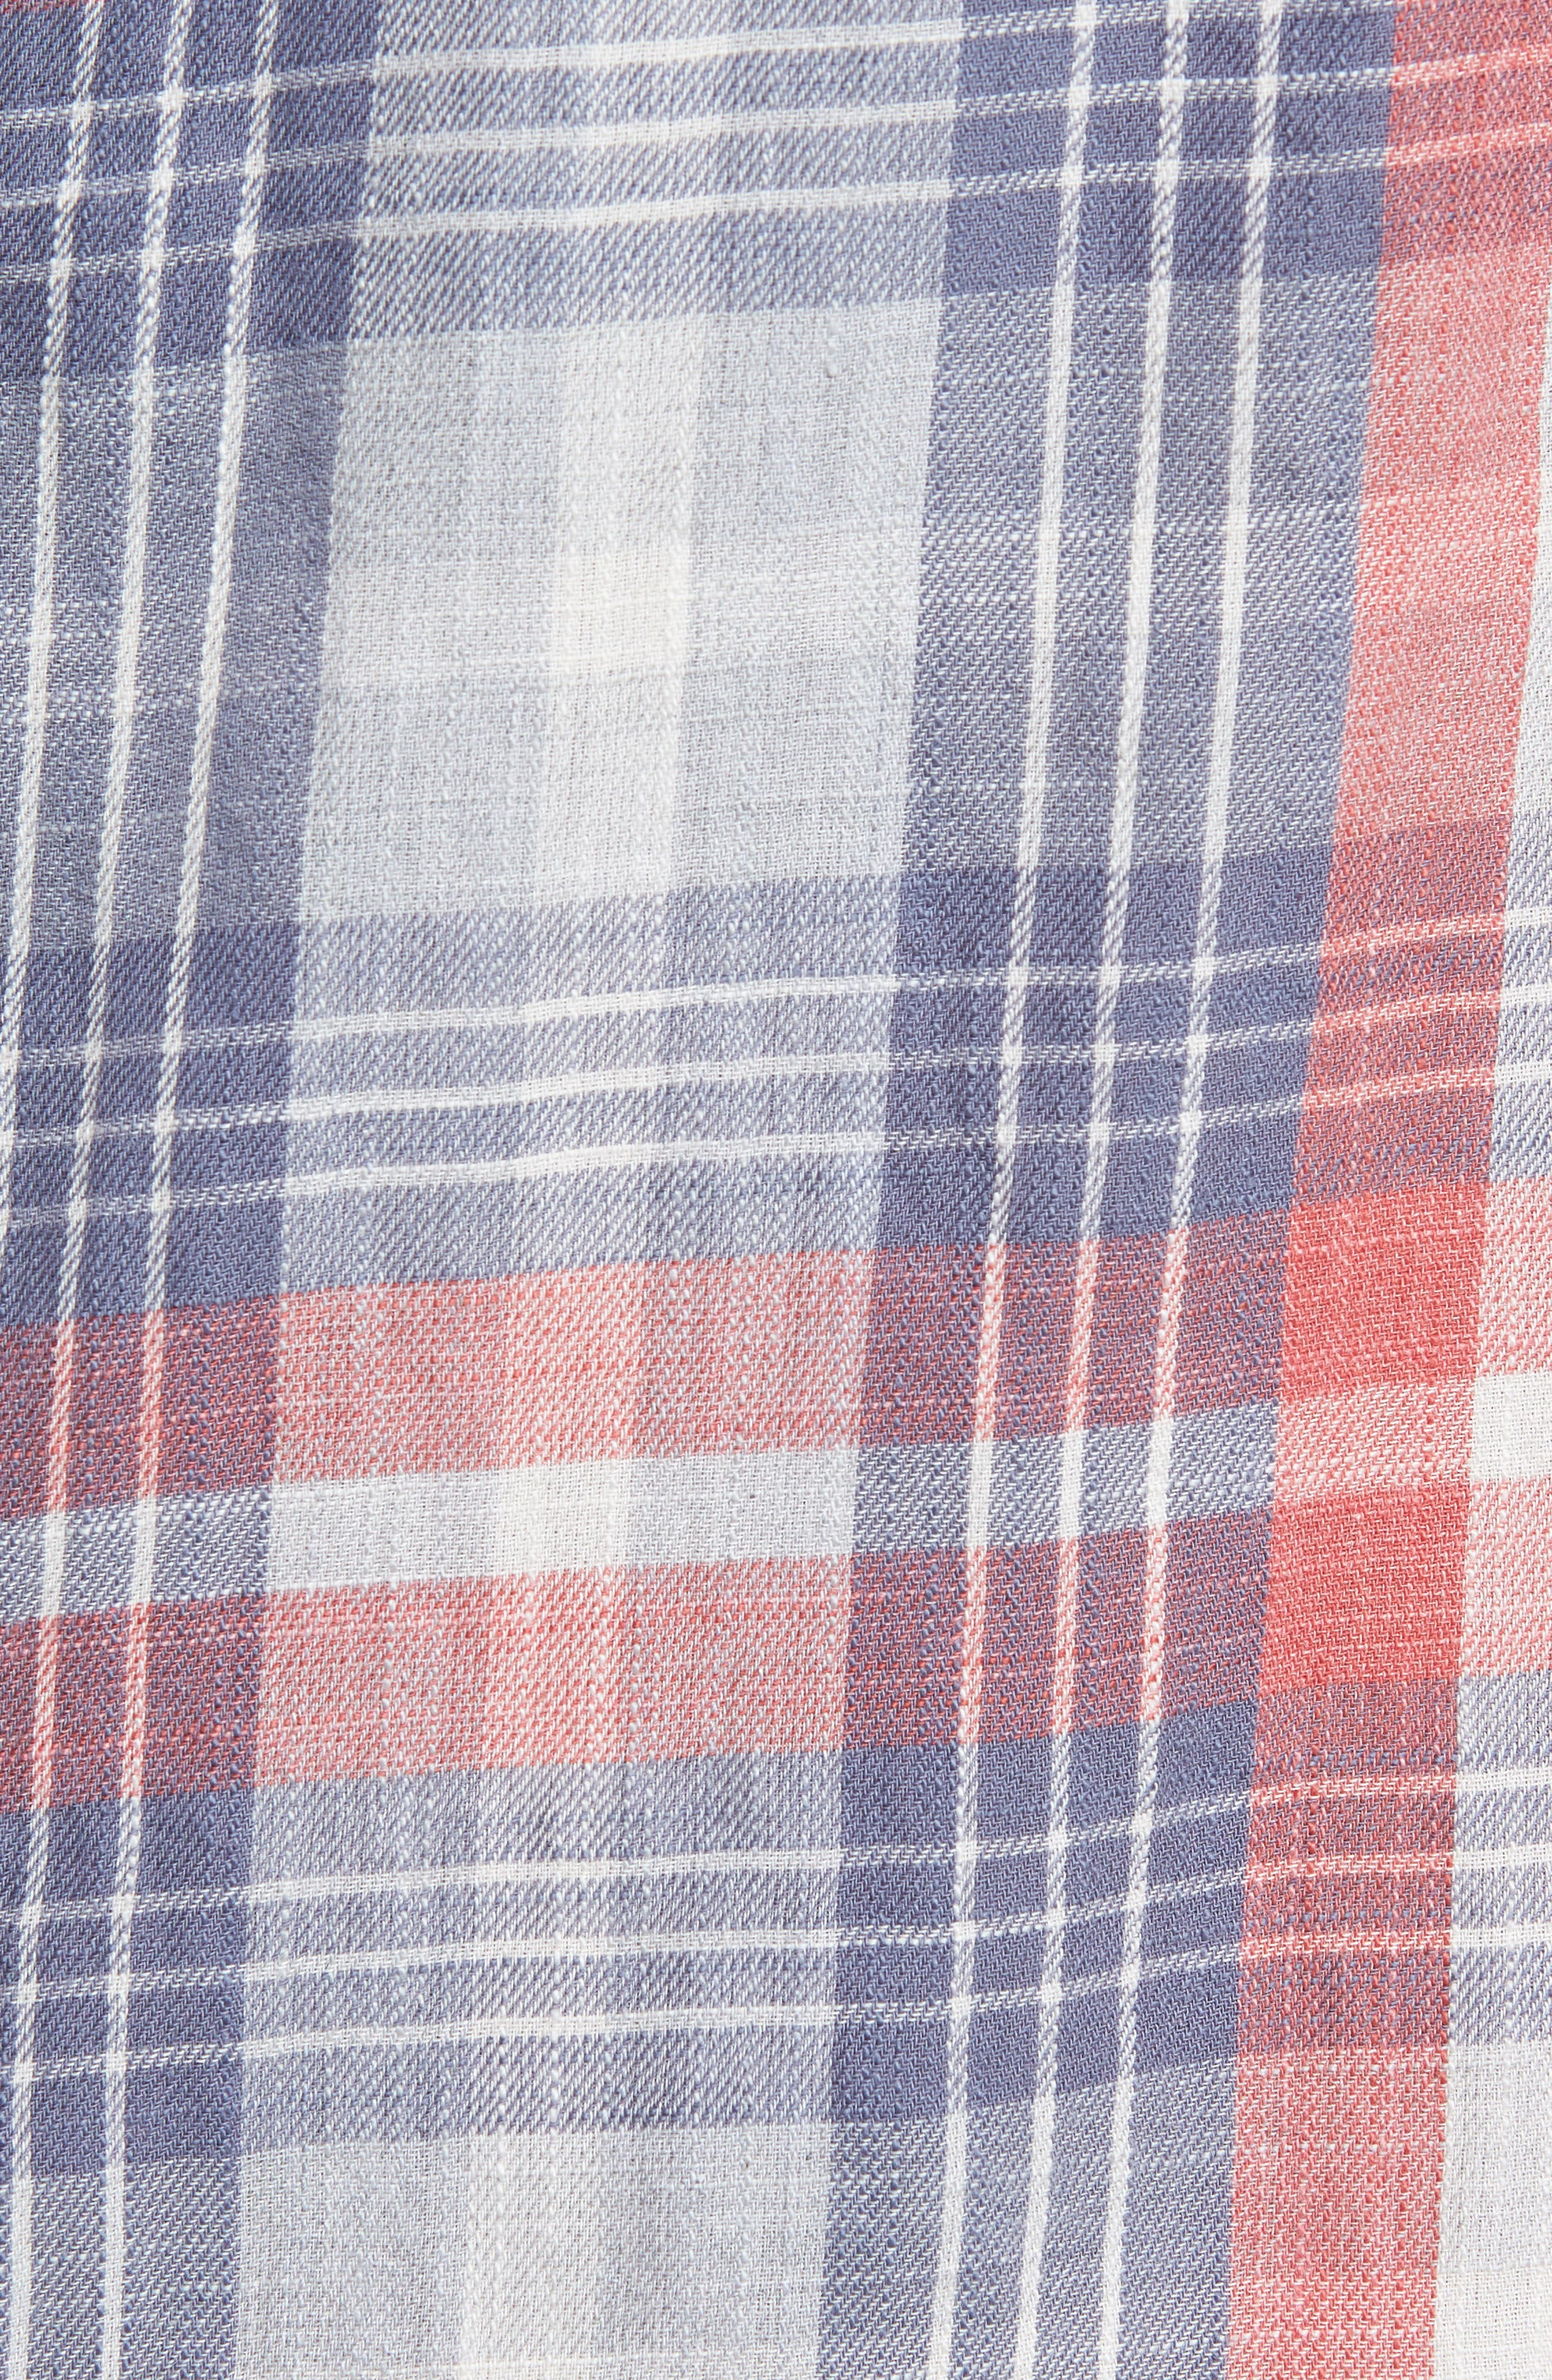 Reynolds Short Sleeve Sport Shirt,                             Alternate thumbnail 5, color,                             Red Gray Plaid